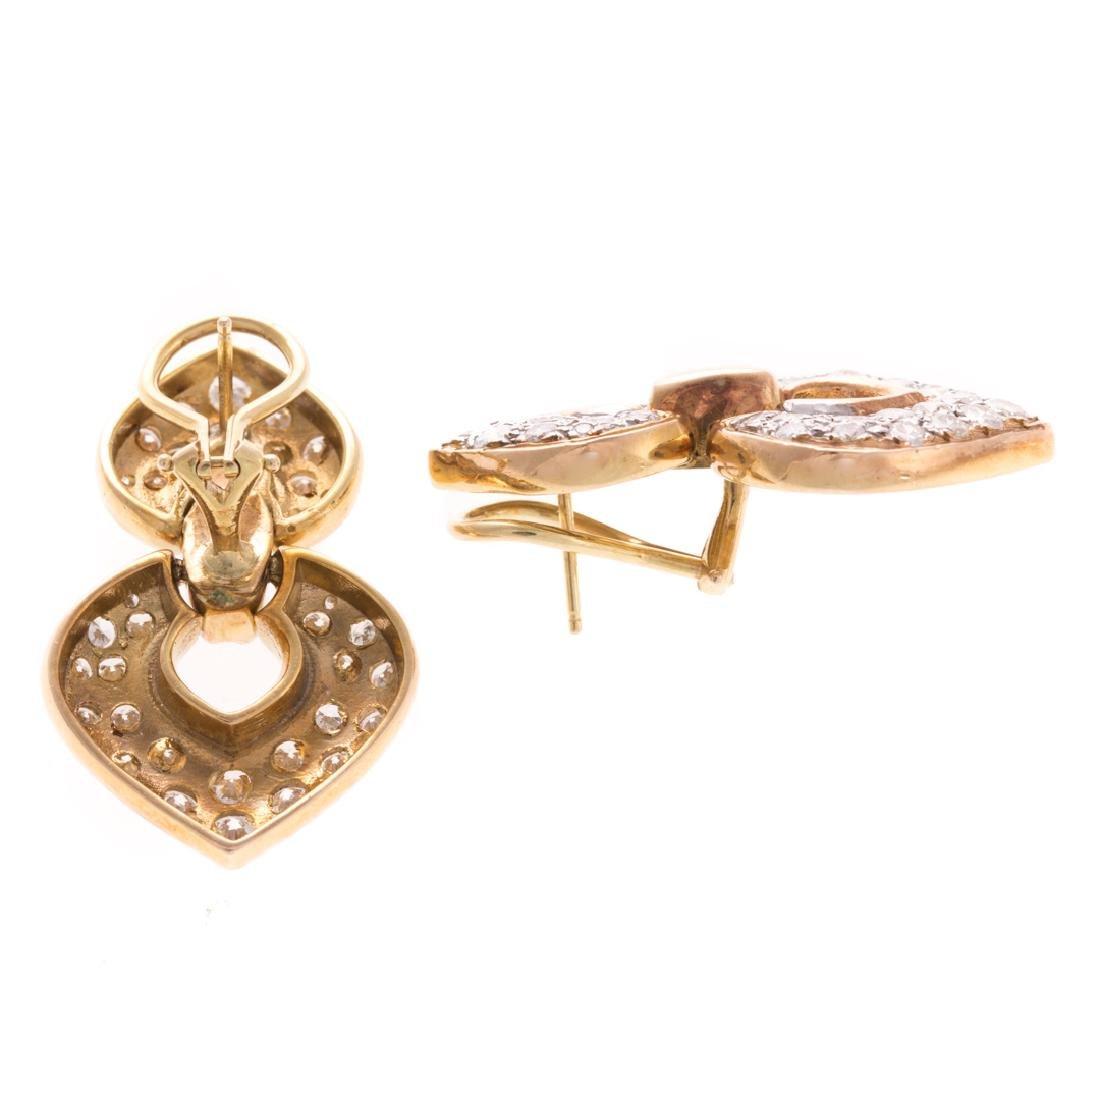 A Lady's 14K Diamond Ear Pendants - 3